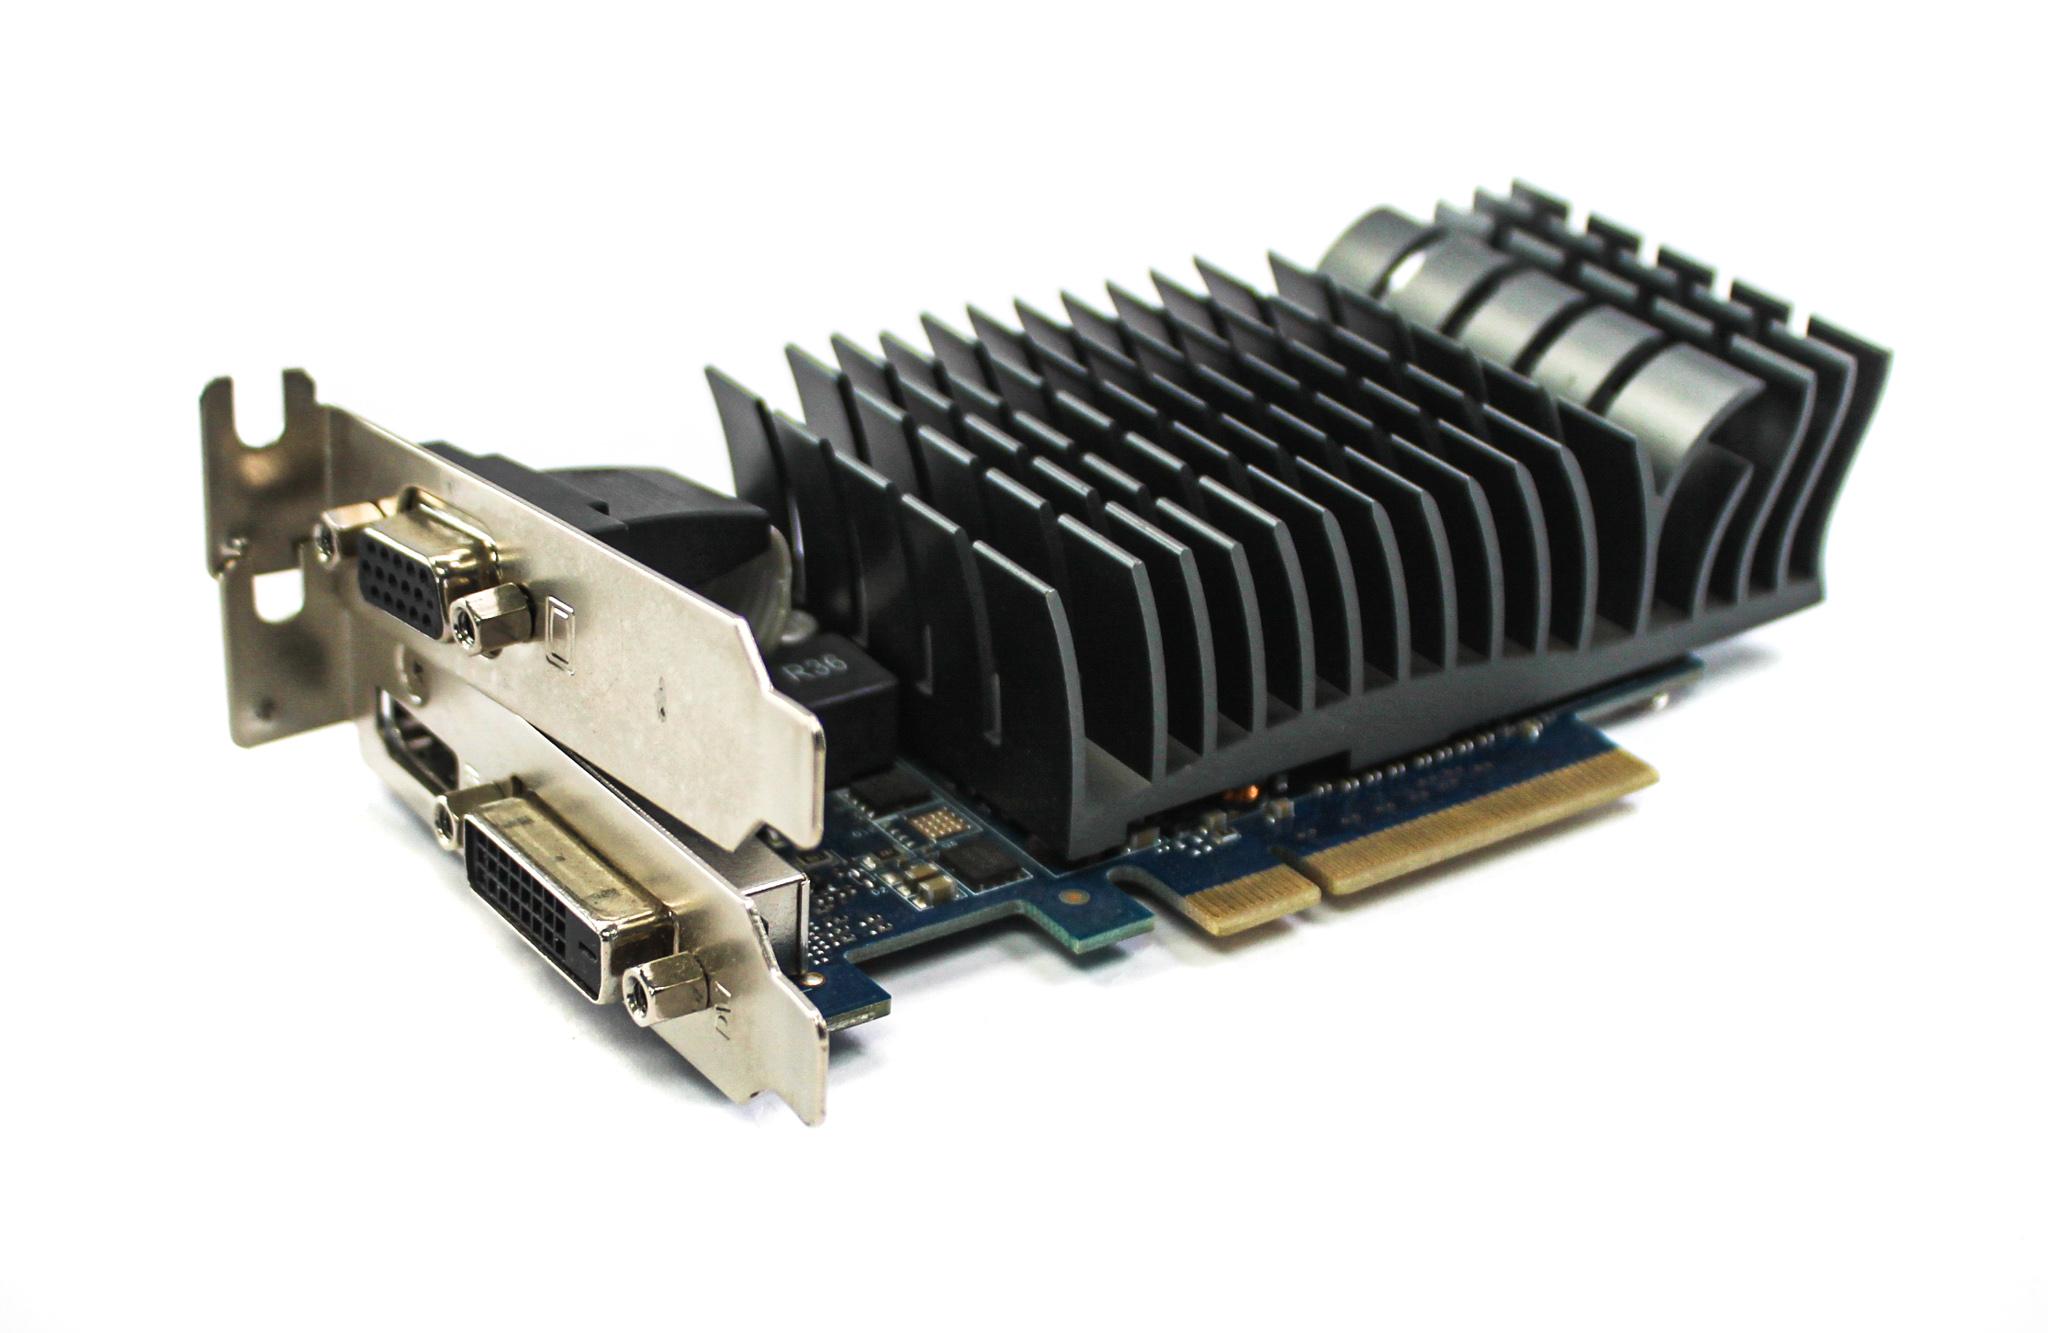 GT730-SL-2GD3-BRK Asus GeForce GT730 2GB PCIe VGA/HDMI/DVI LP Graphics Card